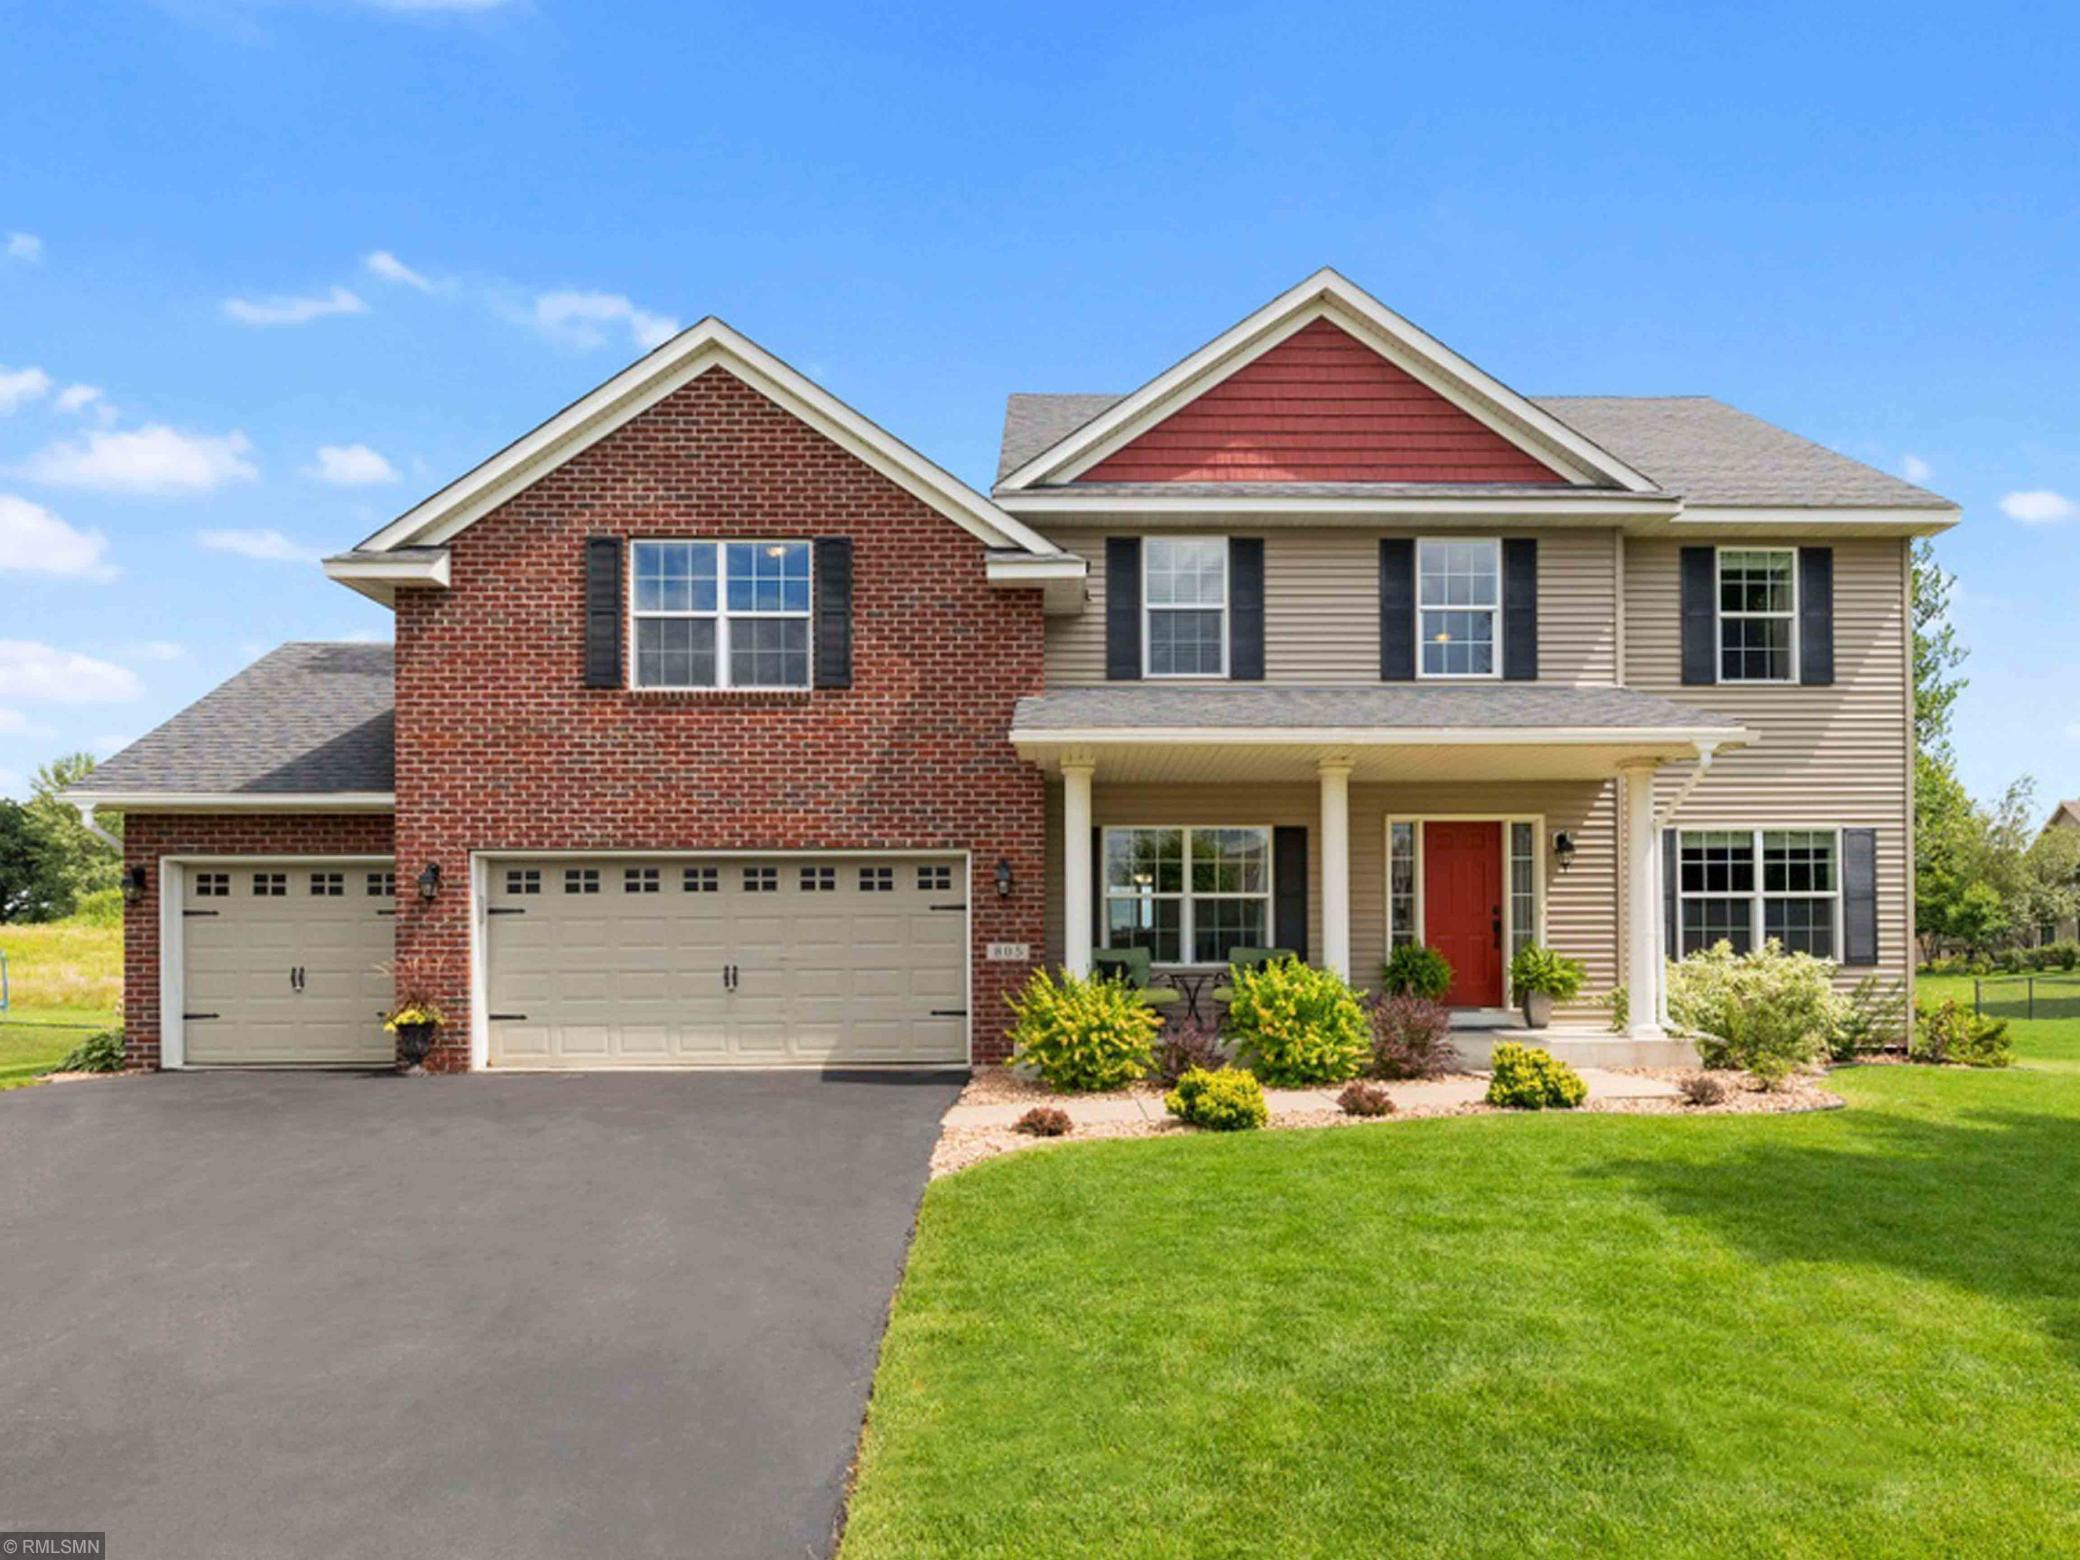 805 Riverview Lane Property Photo - Belle Plaine, MN real estate listing